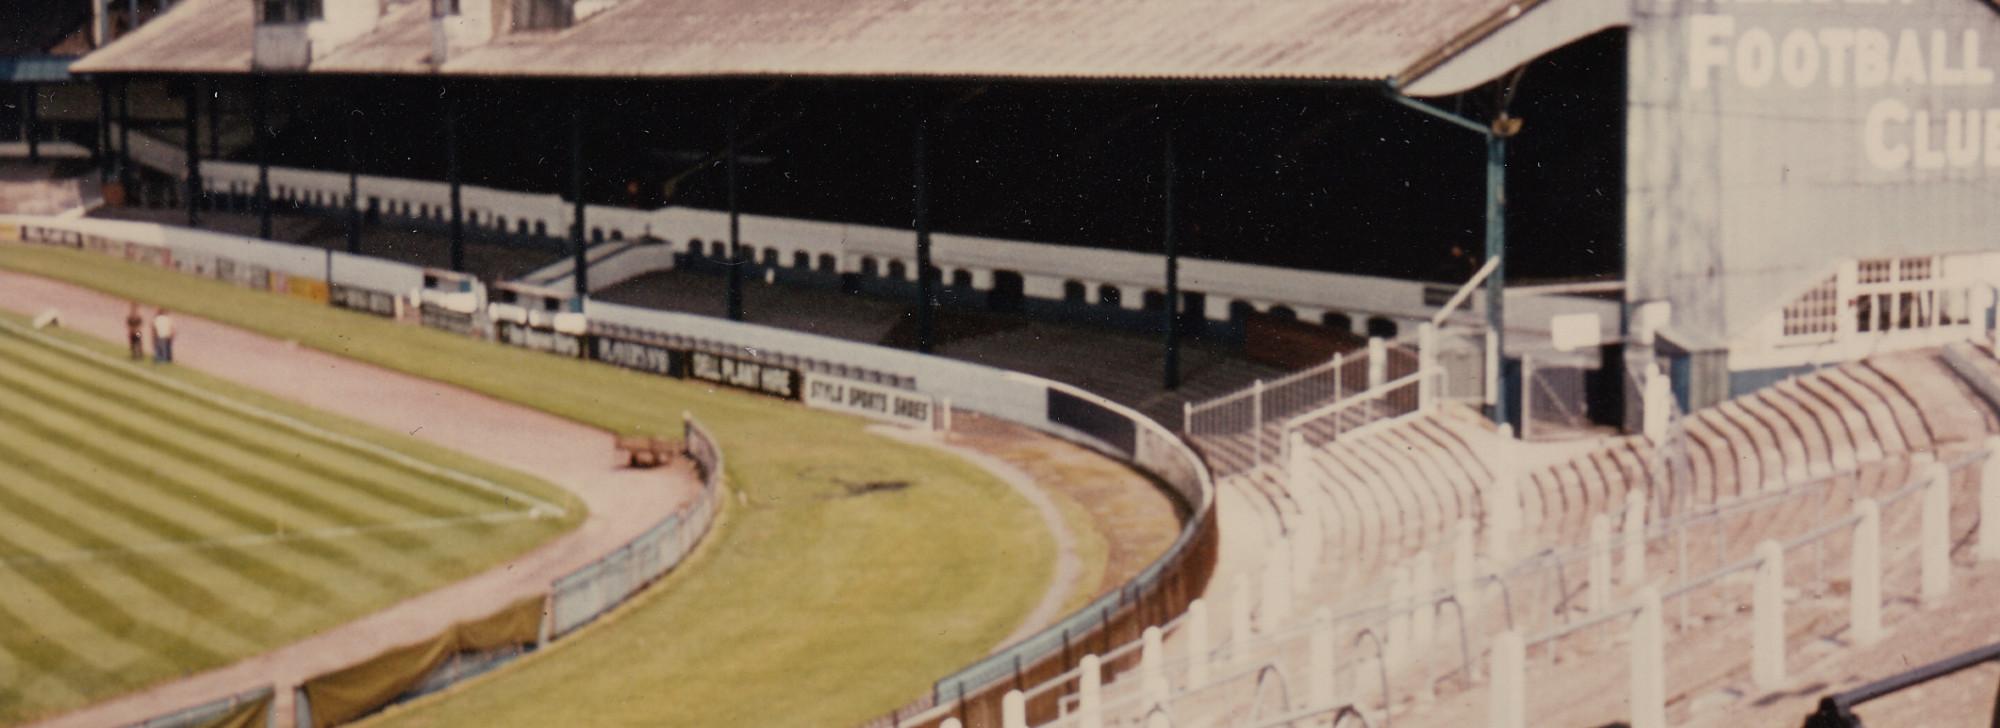 Chelsea - Stamford Bridge - East Stand 5 - August 1969